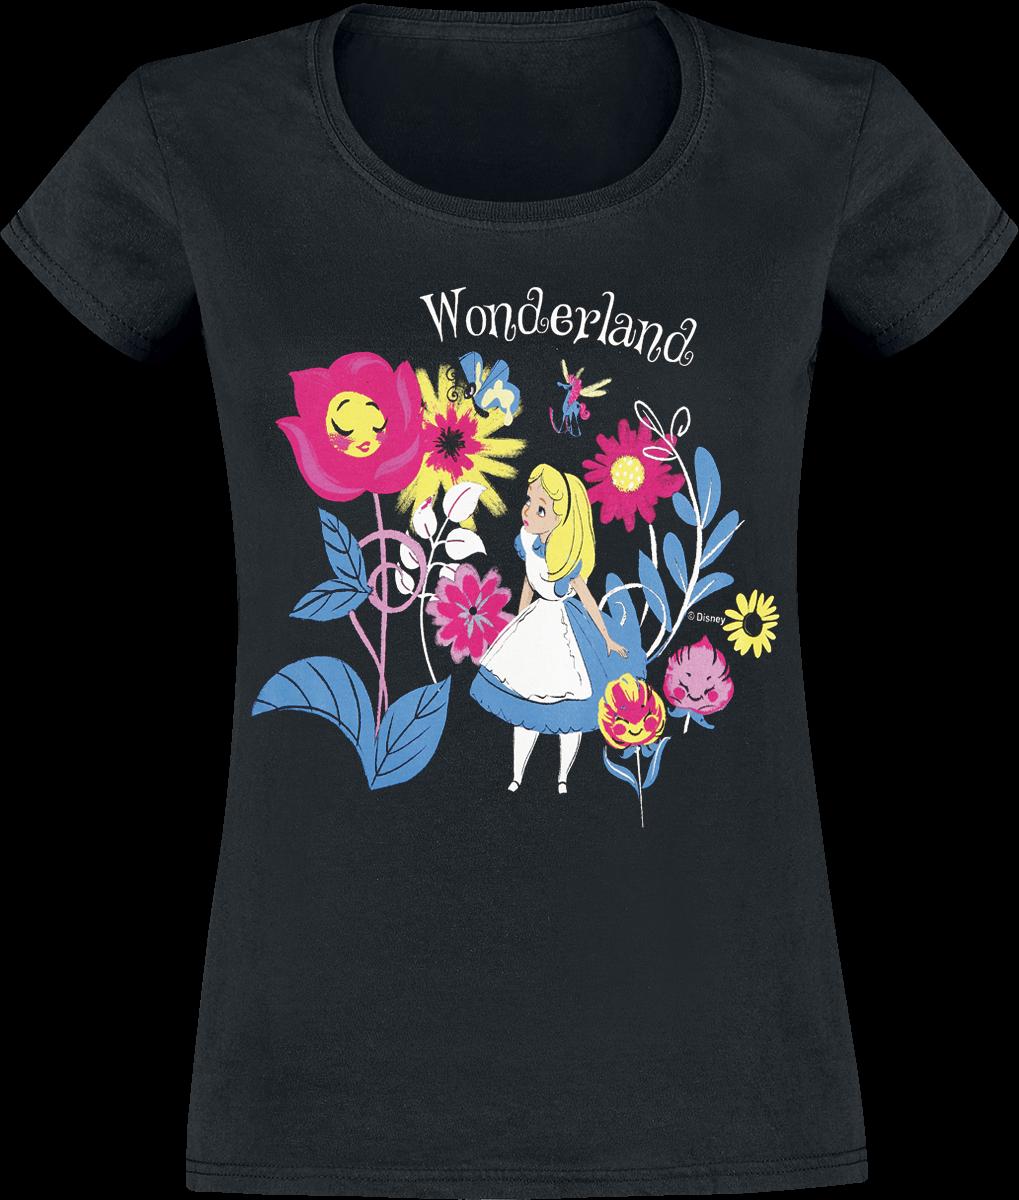 Alice in Wonderland - Butterflies And Flowers - Girls shirt - black image